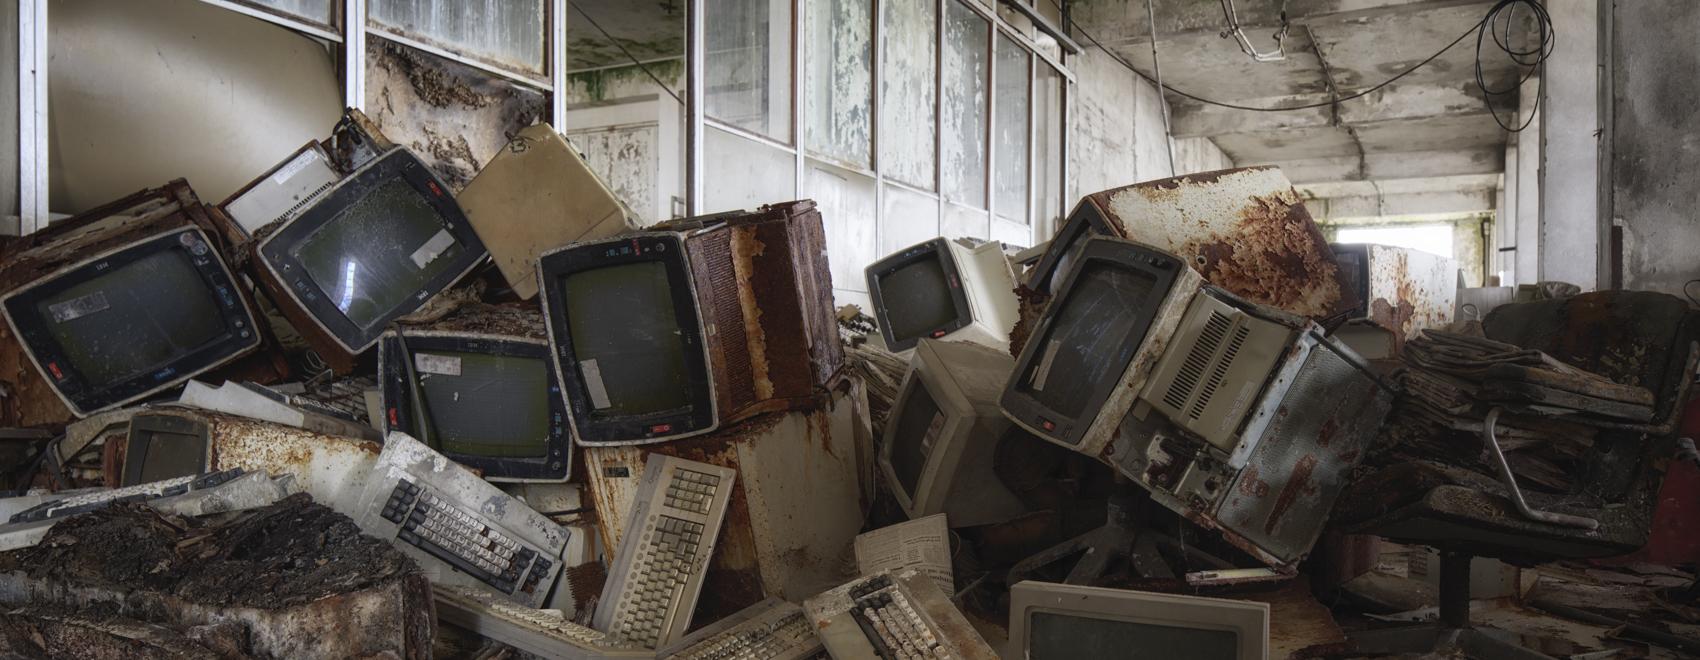 IBM massacre